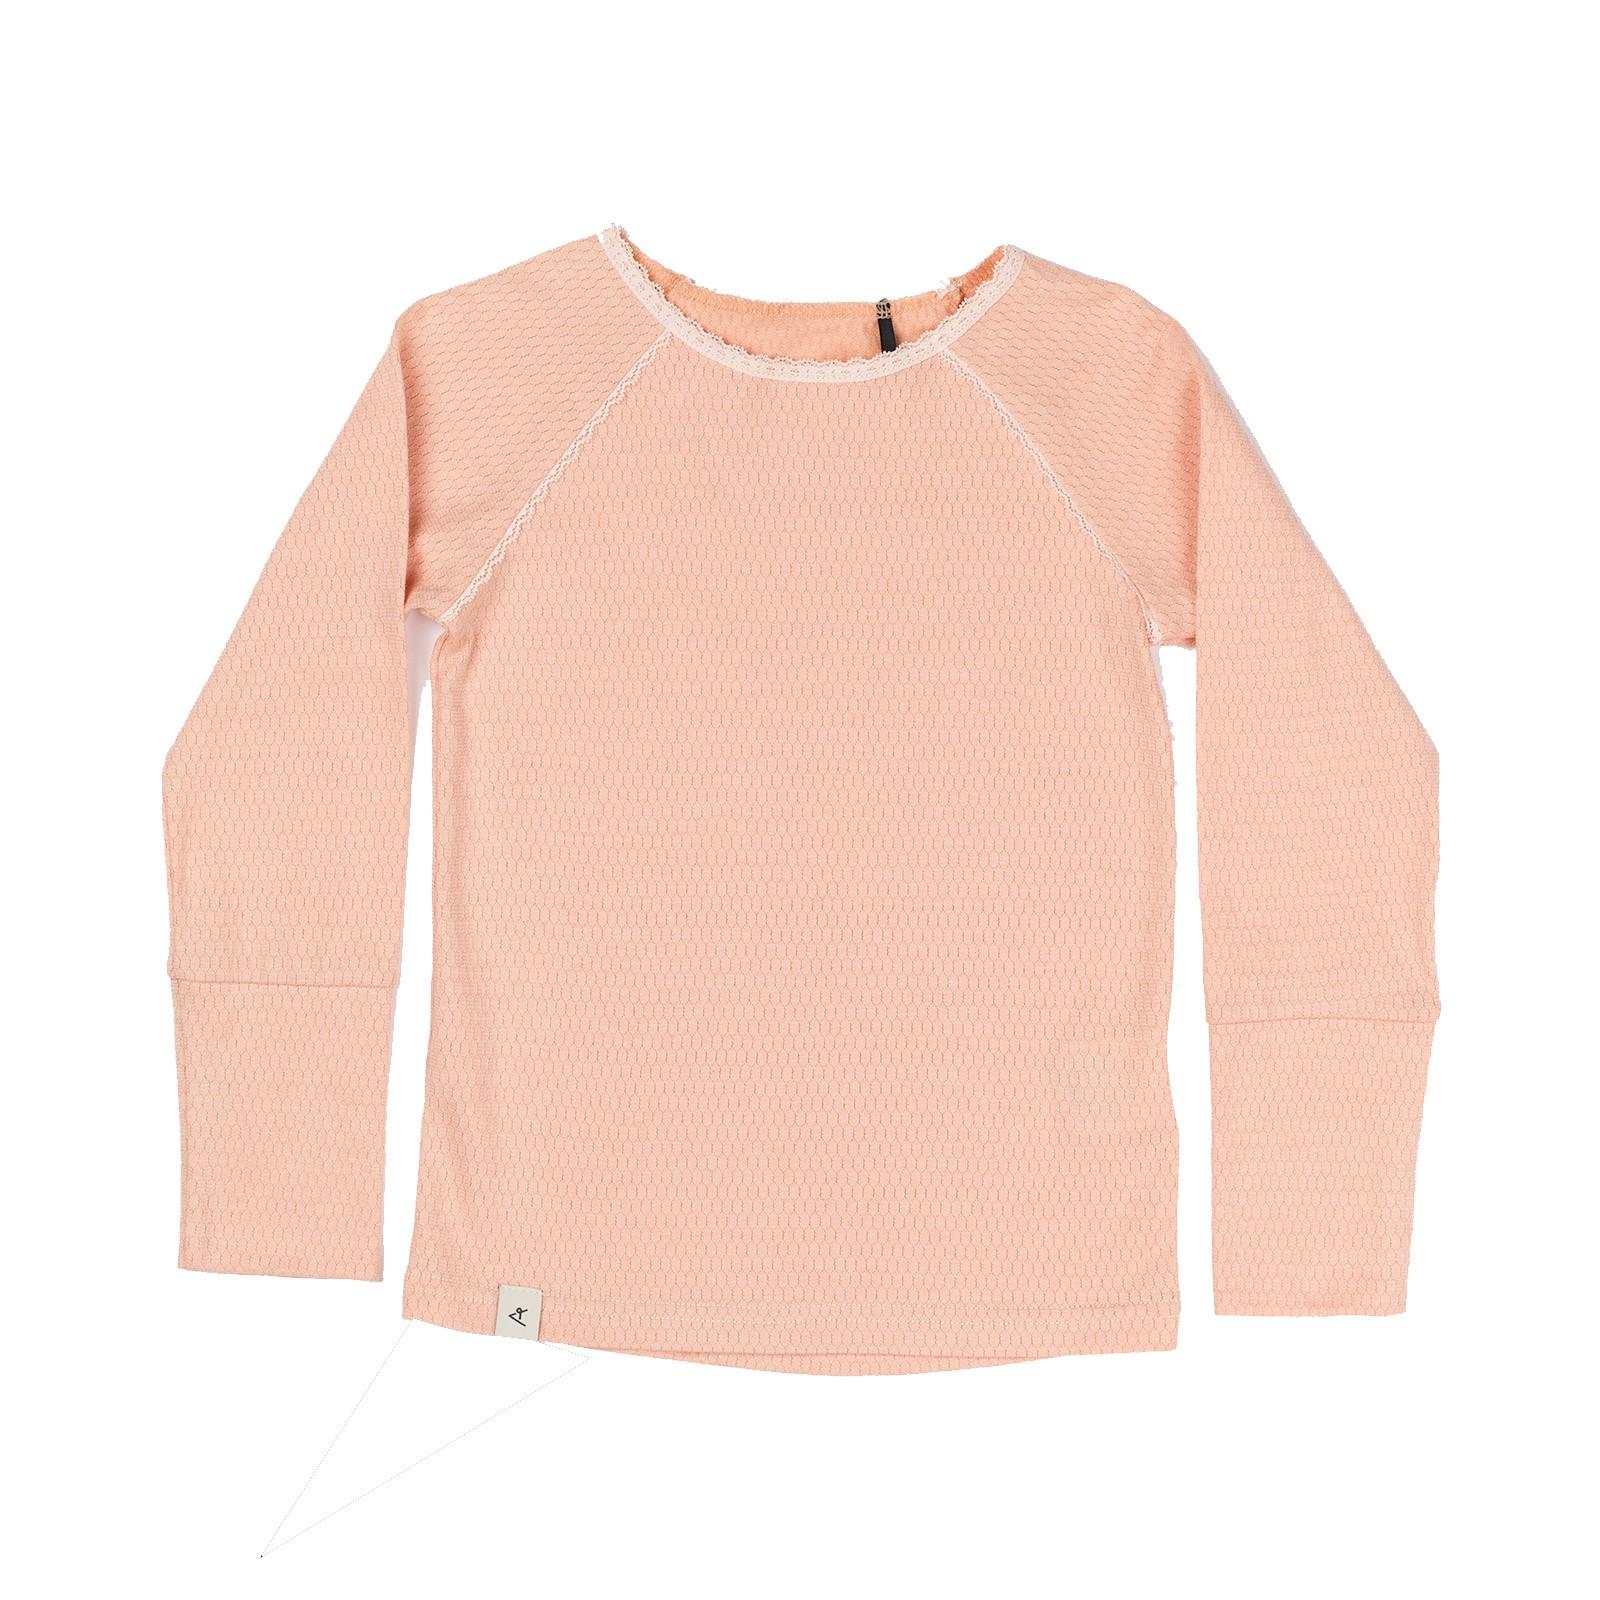 Ghita blouse